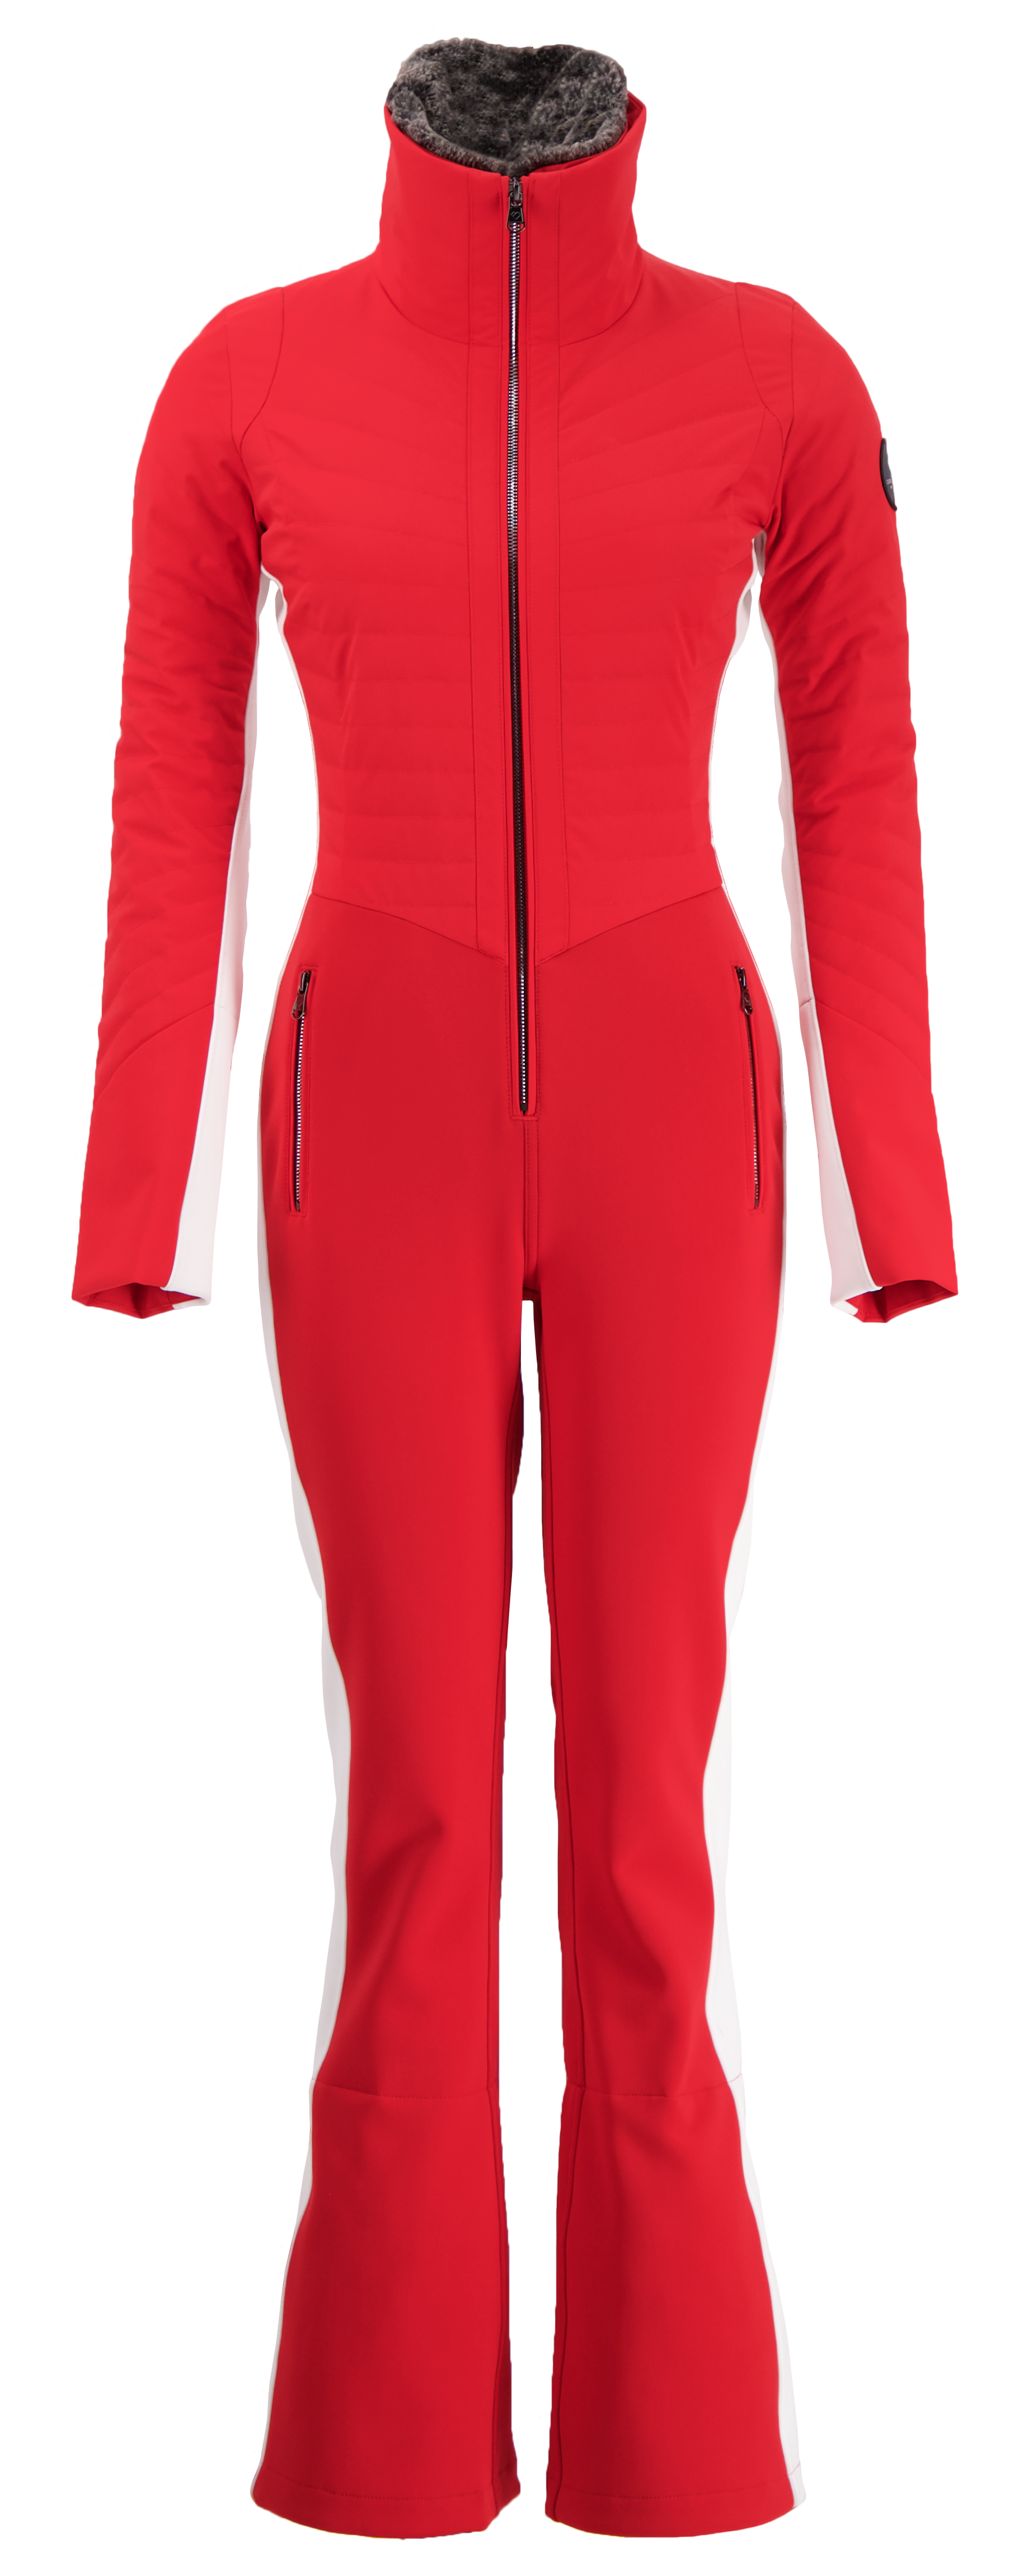 2016 Rossignol Alltrack Pro 110 W